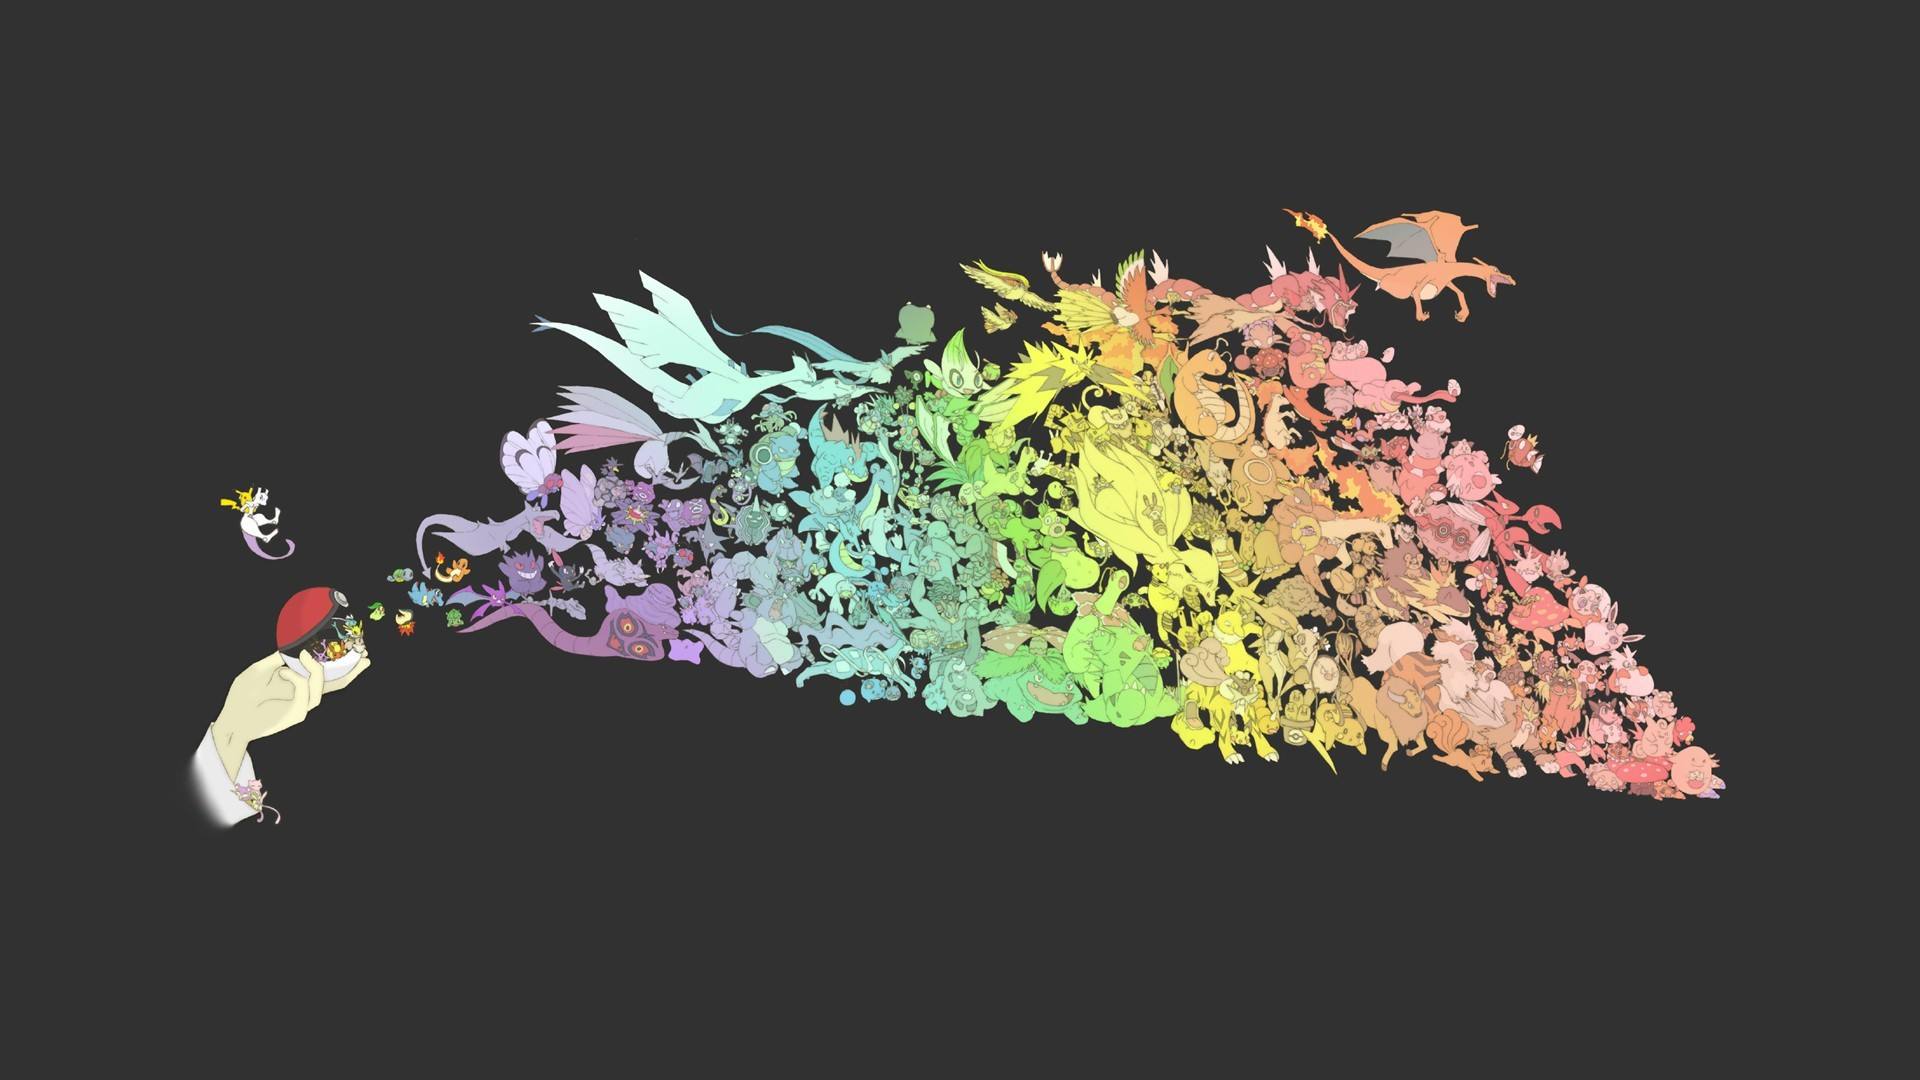 77 Pokemon Wallpaper On Wallpapersafari